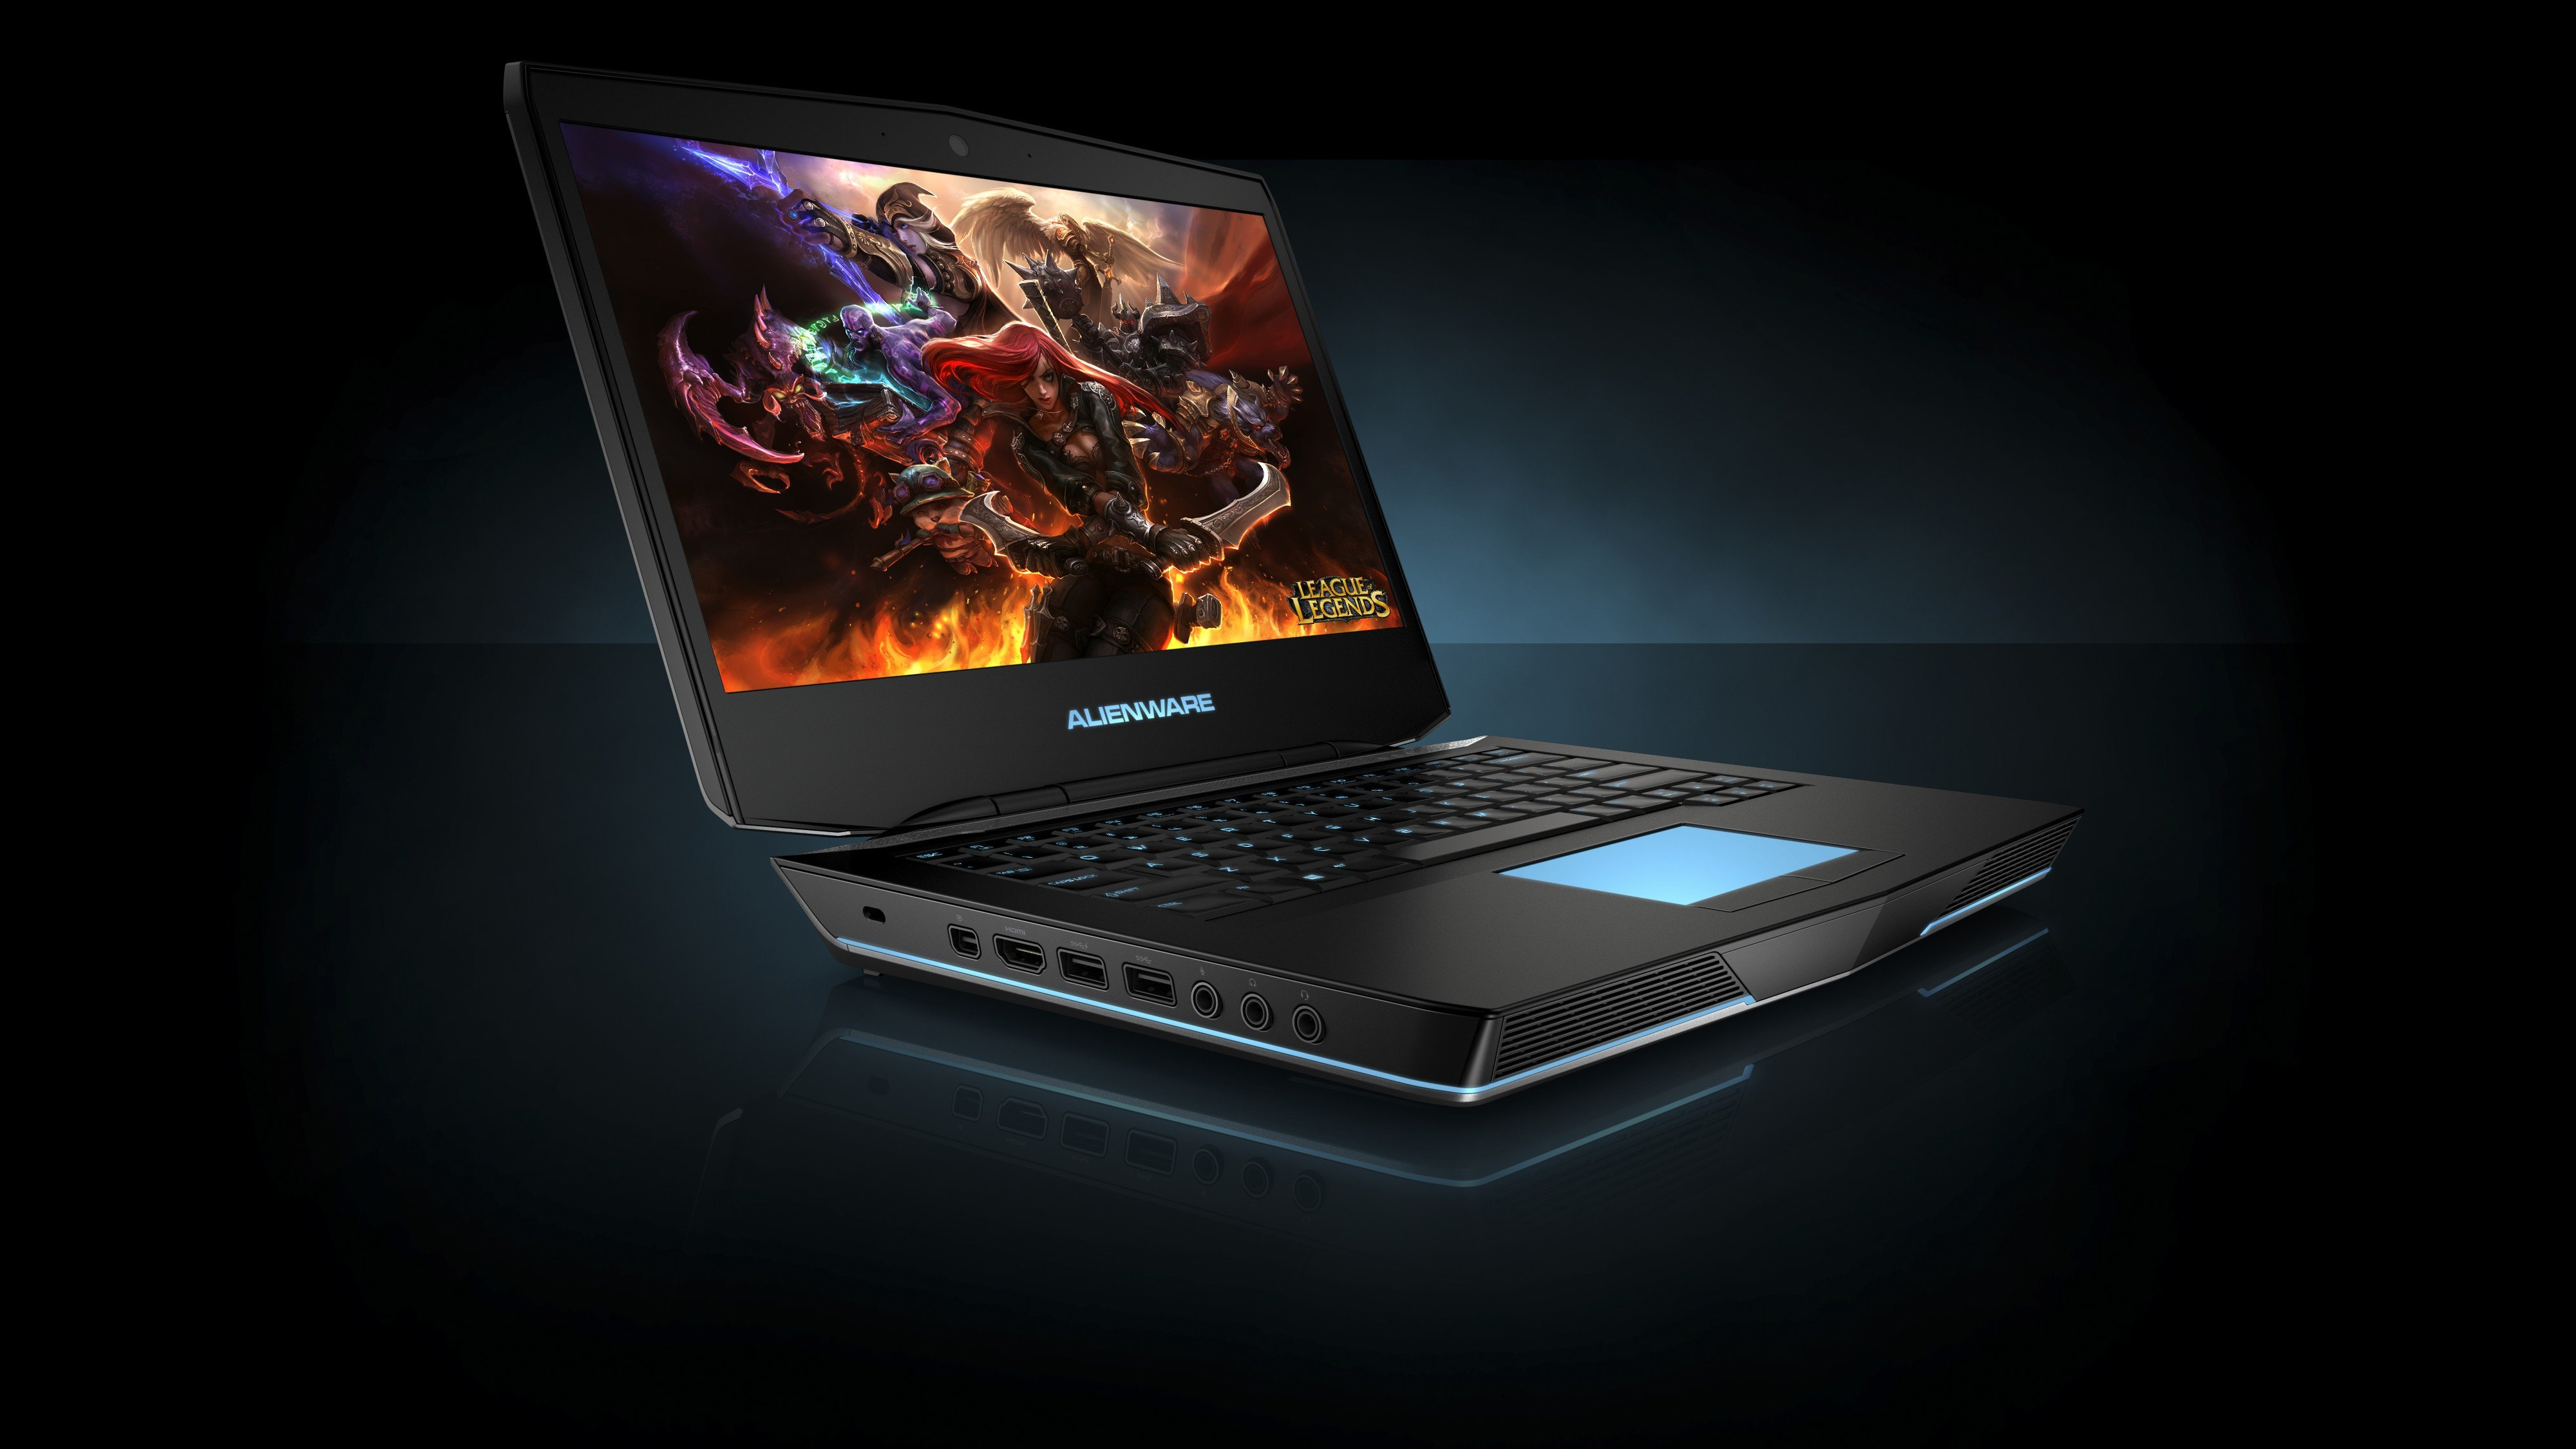 Technology Background Laptop: Notebook Computer Wallpapers, Desktop Backgrounds